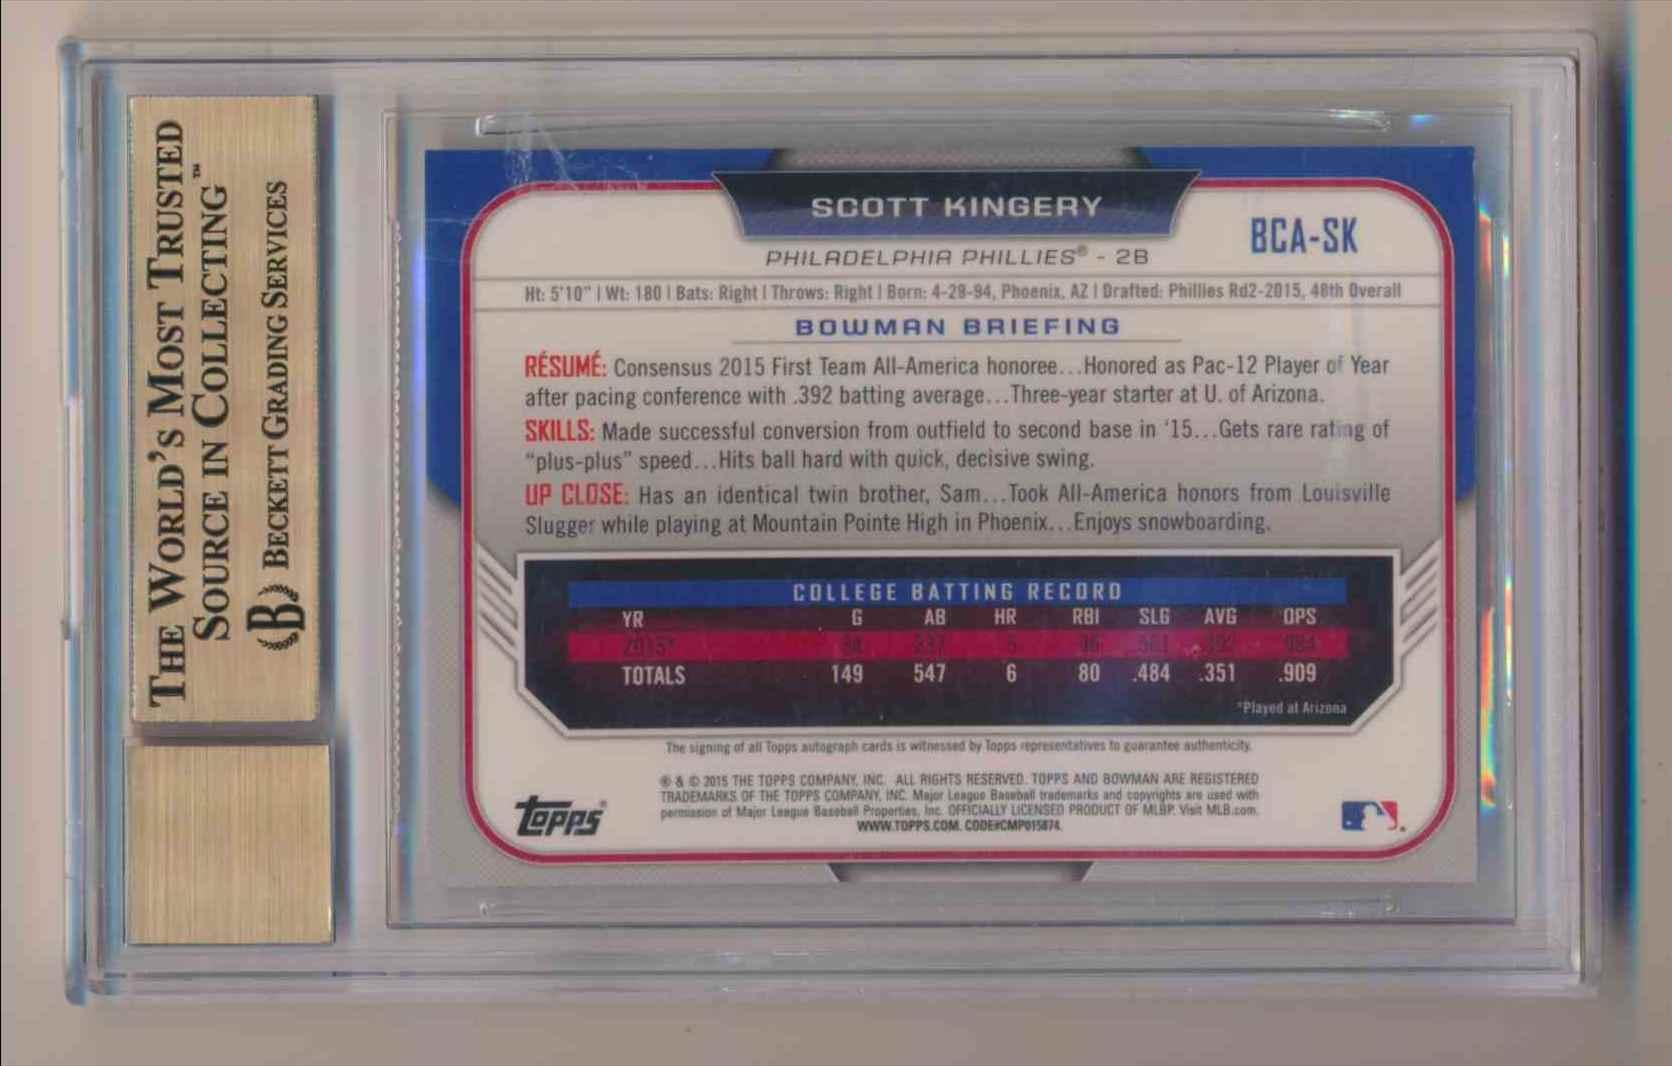 2015 Bowman Chrome Bowman Draft Picks & Prospects BGS 9.5 10 Auto Scott Kingery card back image